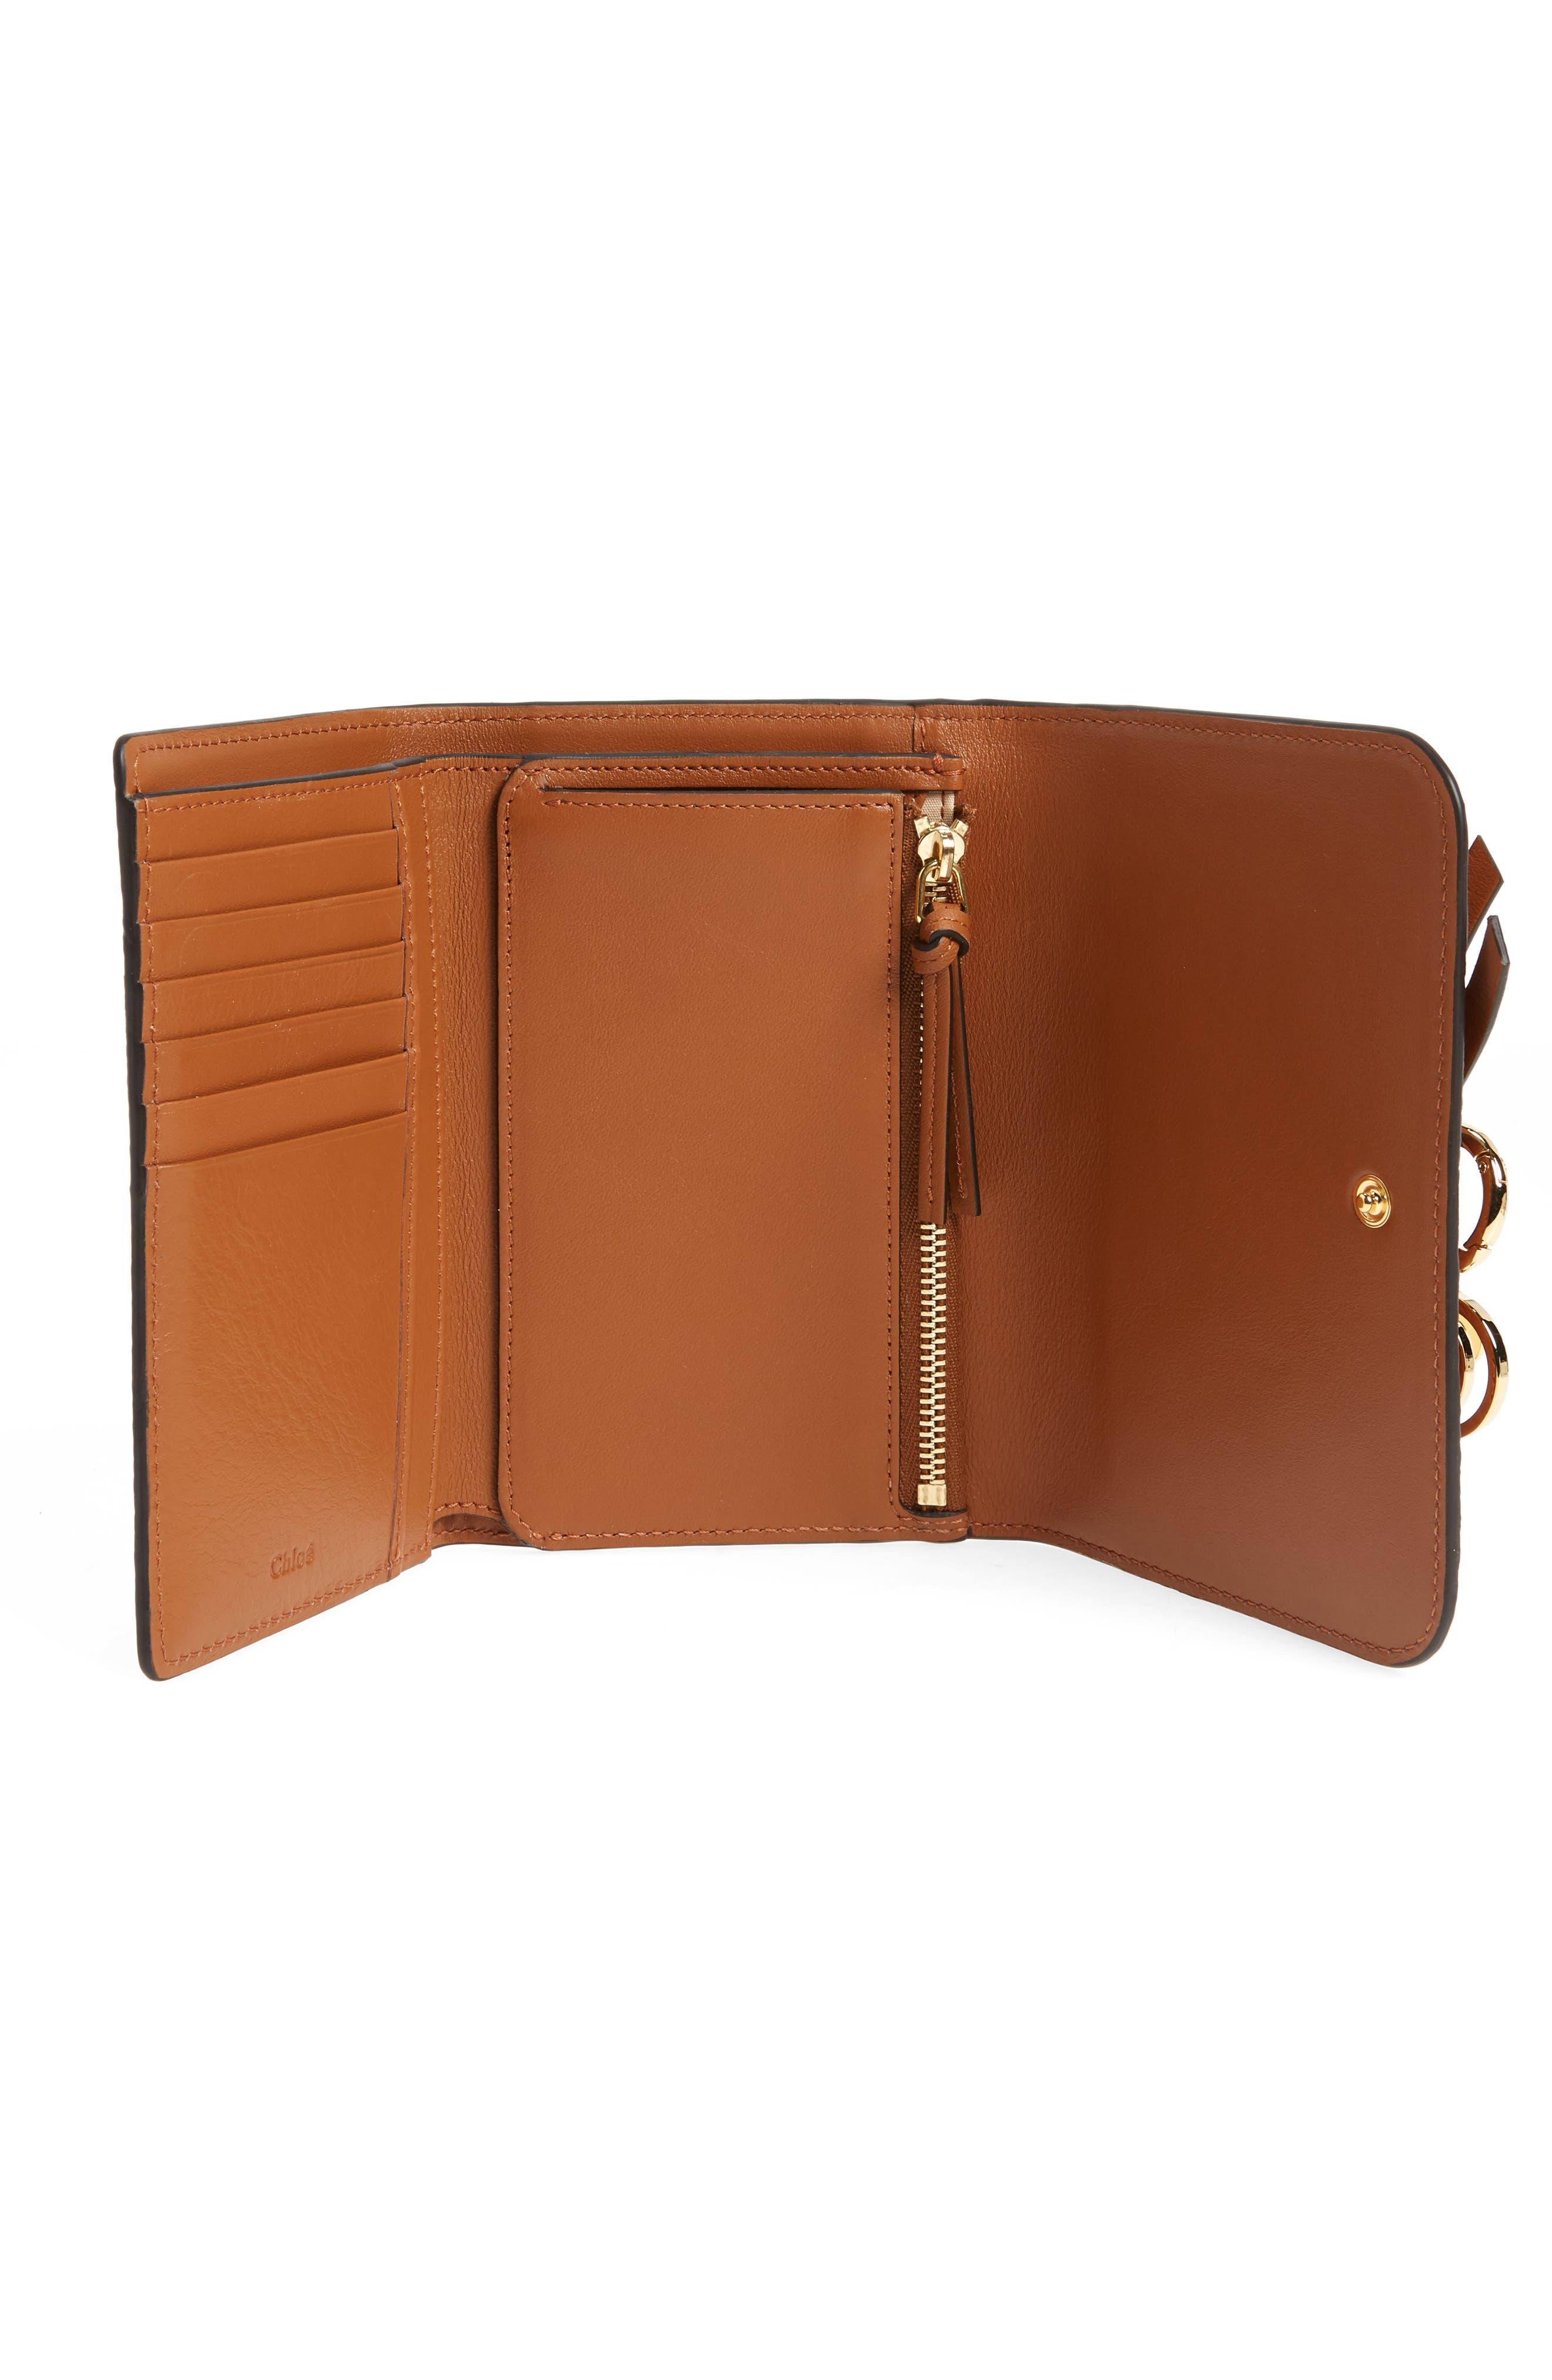 Alphabet Leather Wallet,                             Alternate thumbnail 2, color,                             Tan